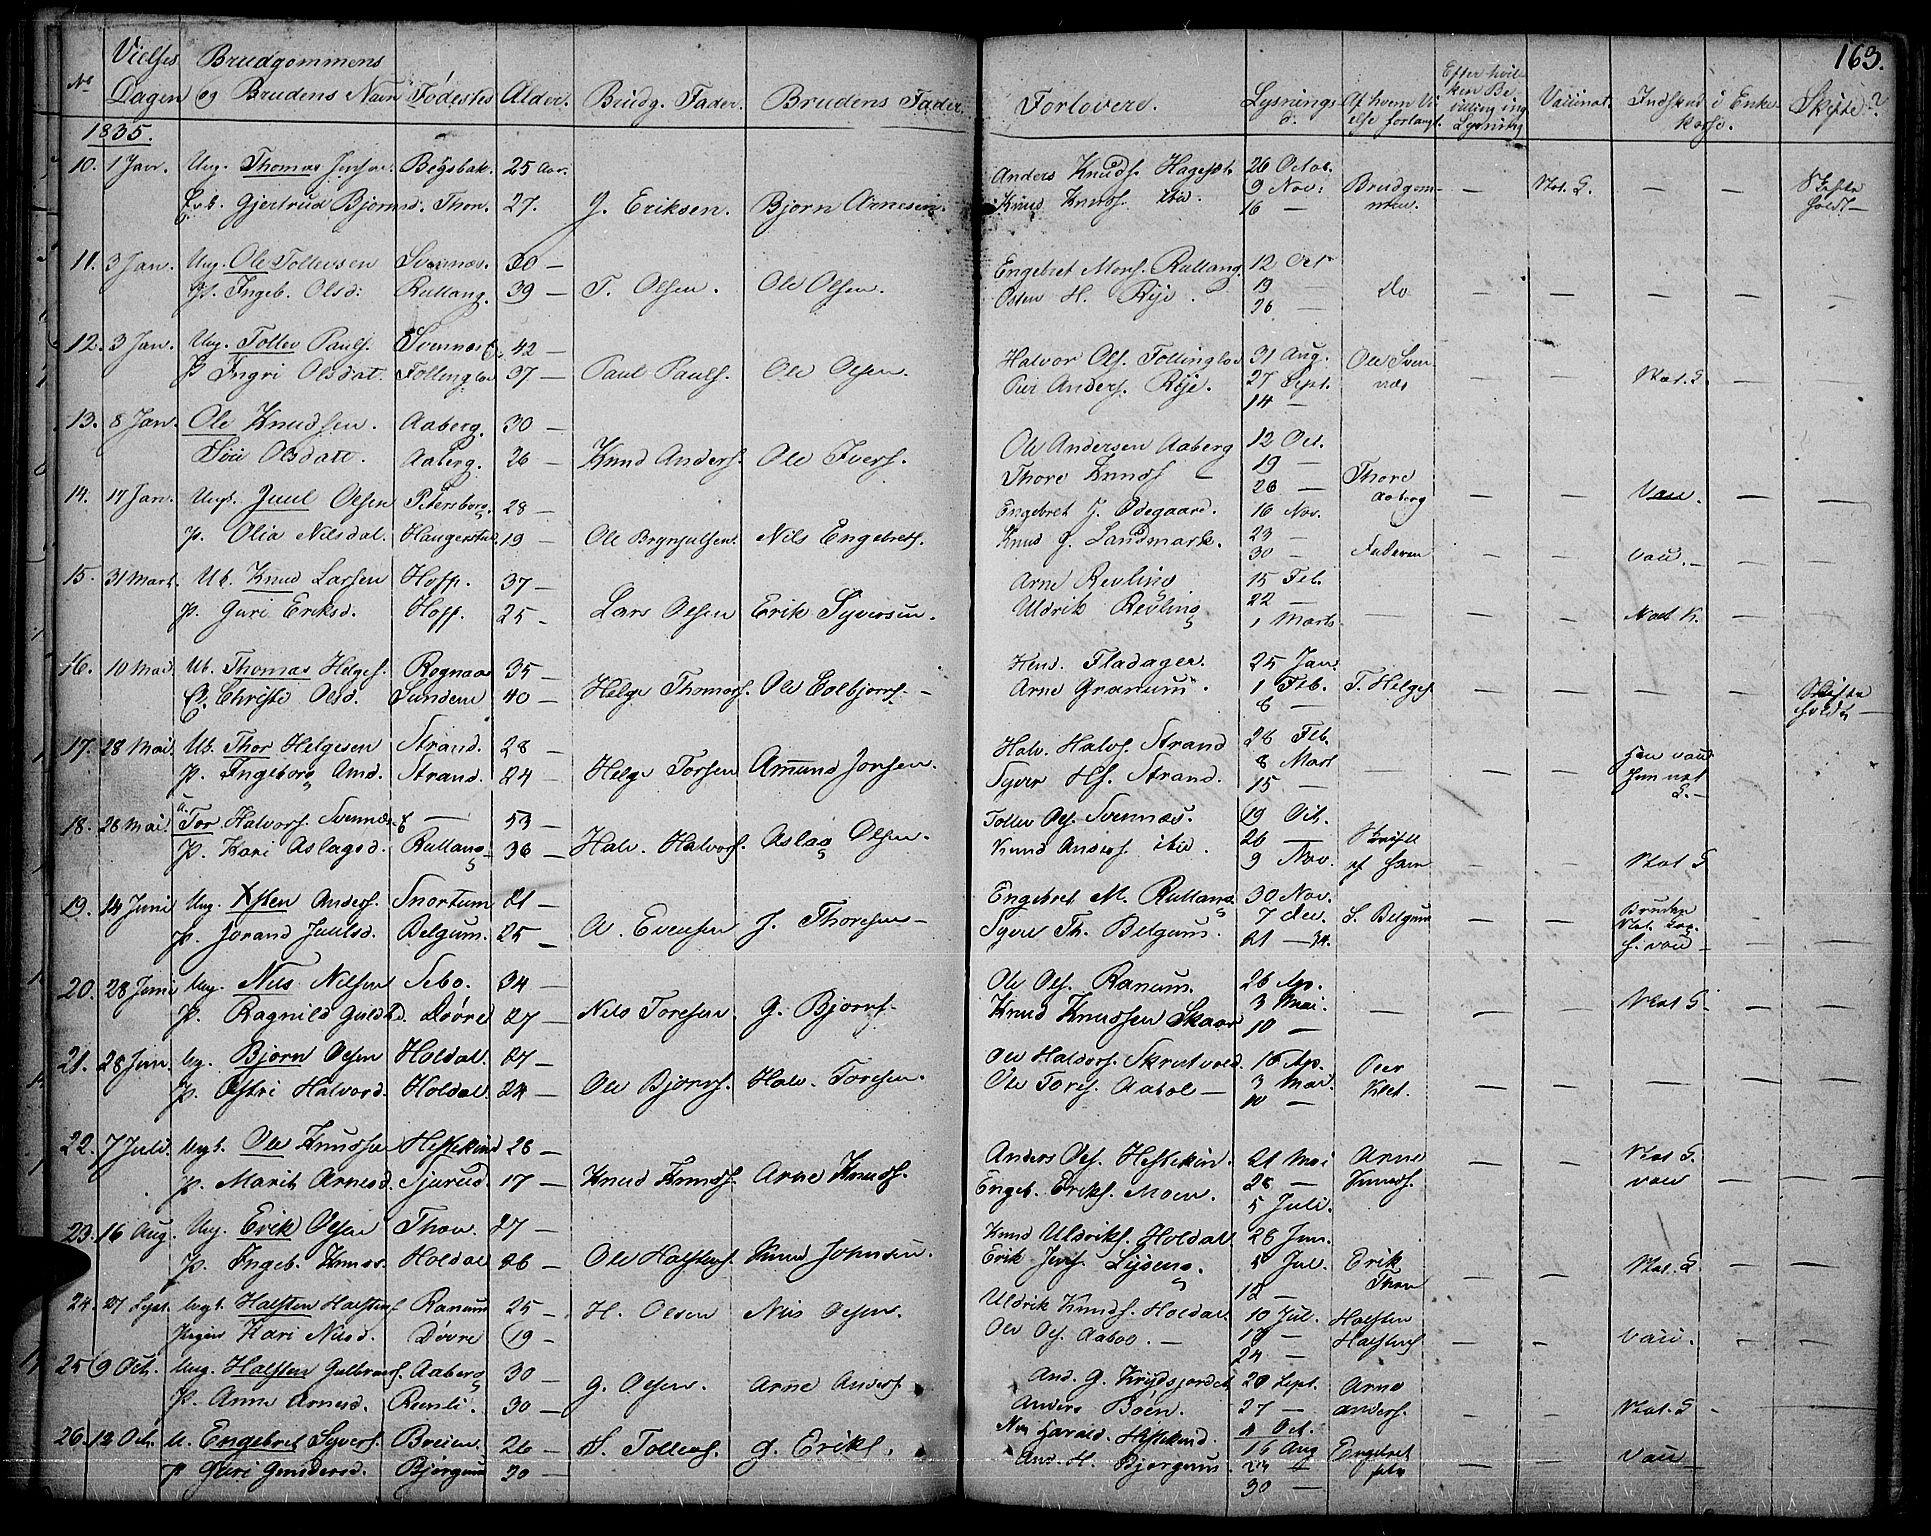 SAH, Nord-Aurdal prestekontor, Ministerialbok nr. 3, 1828-1841, s. 163